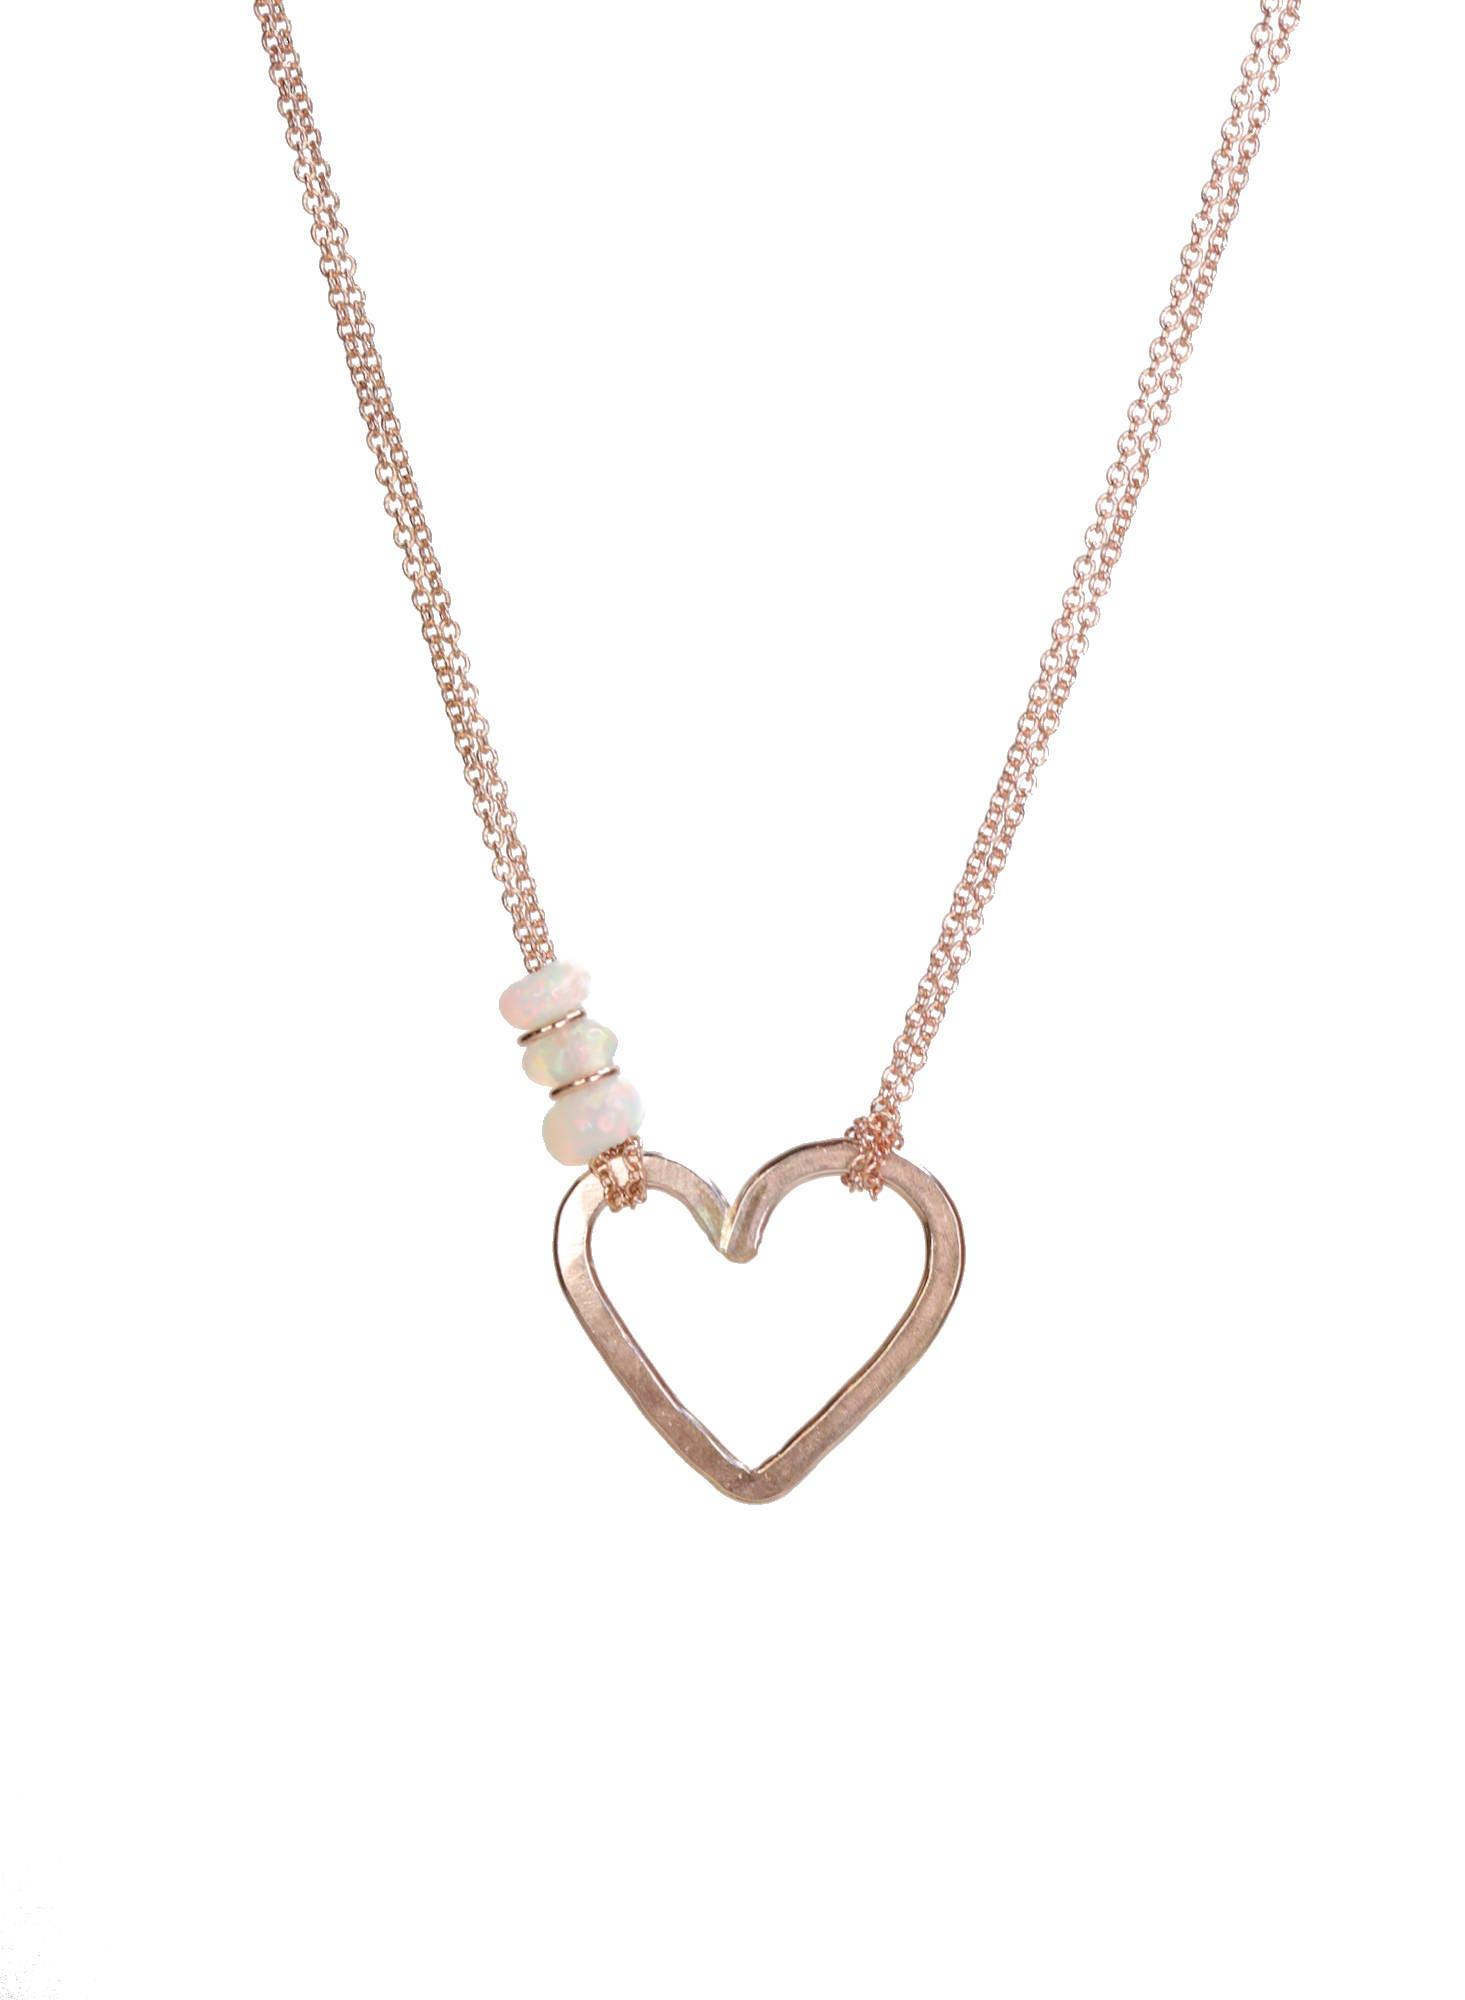 Valentineu0027s Day Jewelry Rose Gold Heart Pendant Necklace Ethiopian Welo  Opal Gemstone Slider Necklace Modern Elegant Romantic